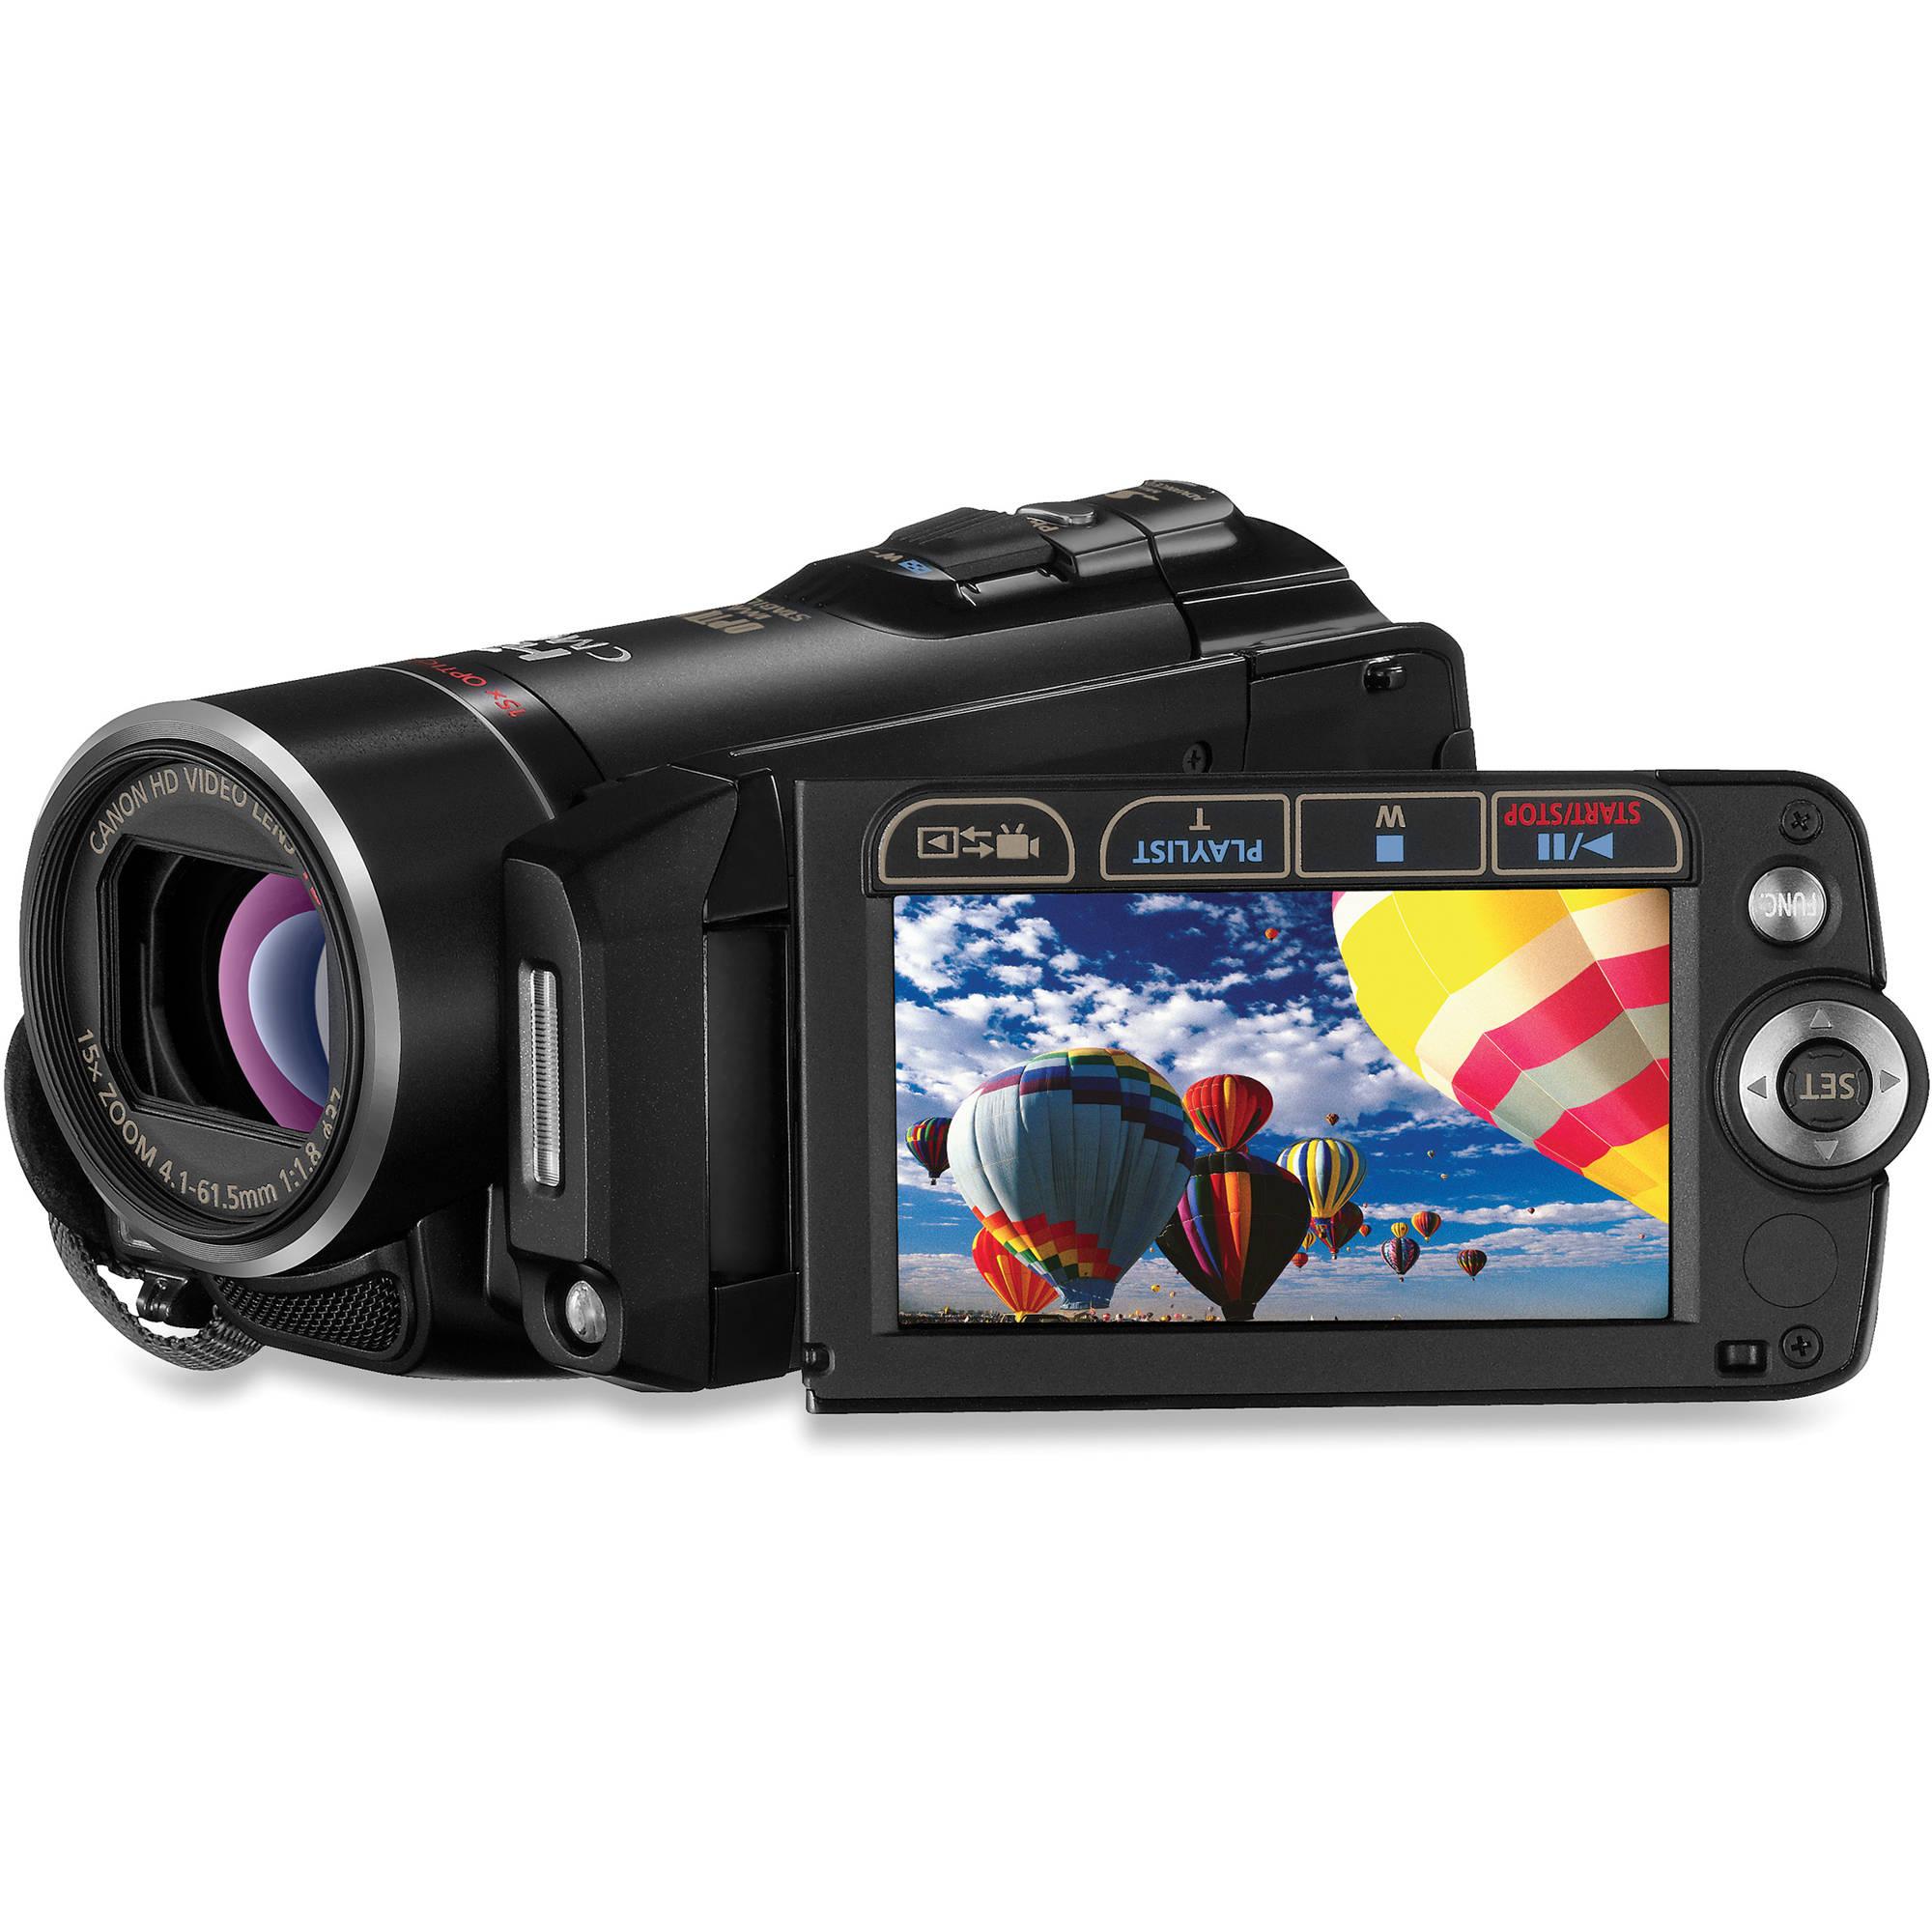 canon vixia hf21 dual flash memory camcorder 4060b001 b h photo rh bhphotovideo com canon vixia hg21 manual canon vixia hg21 manual